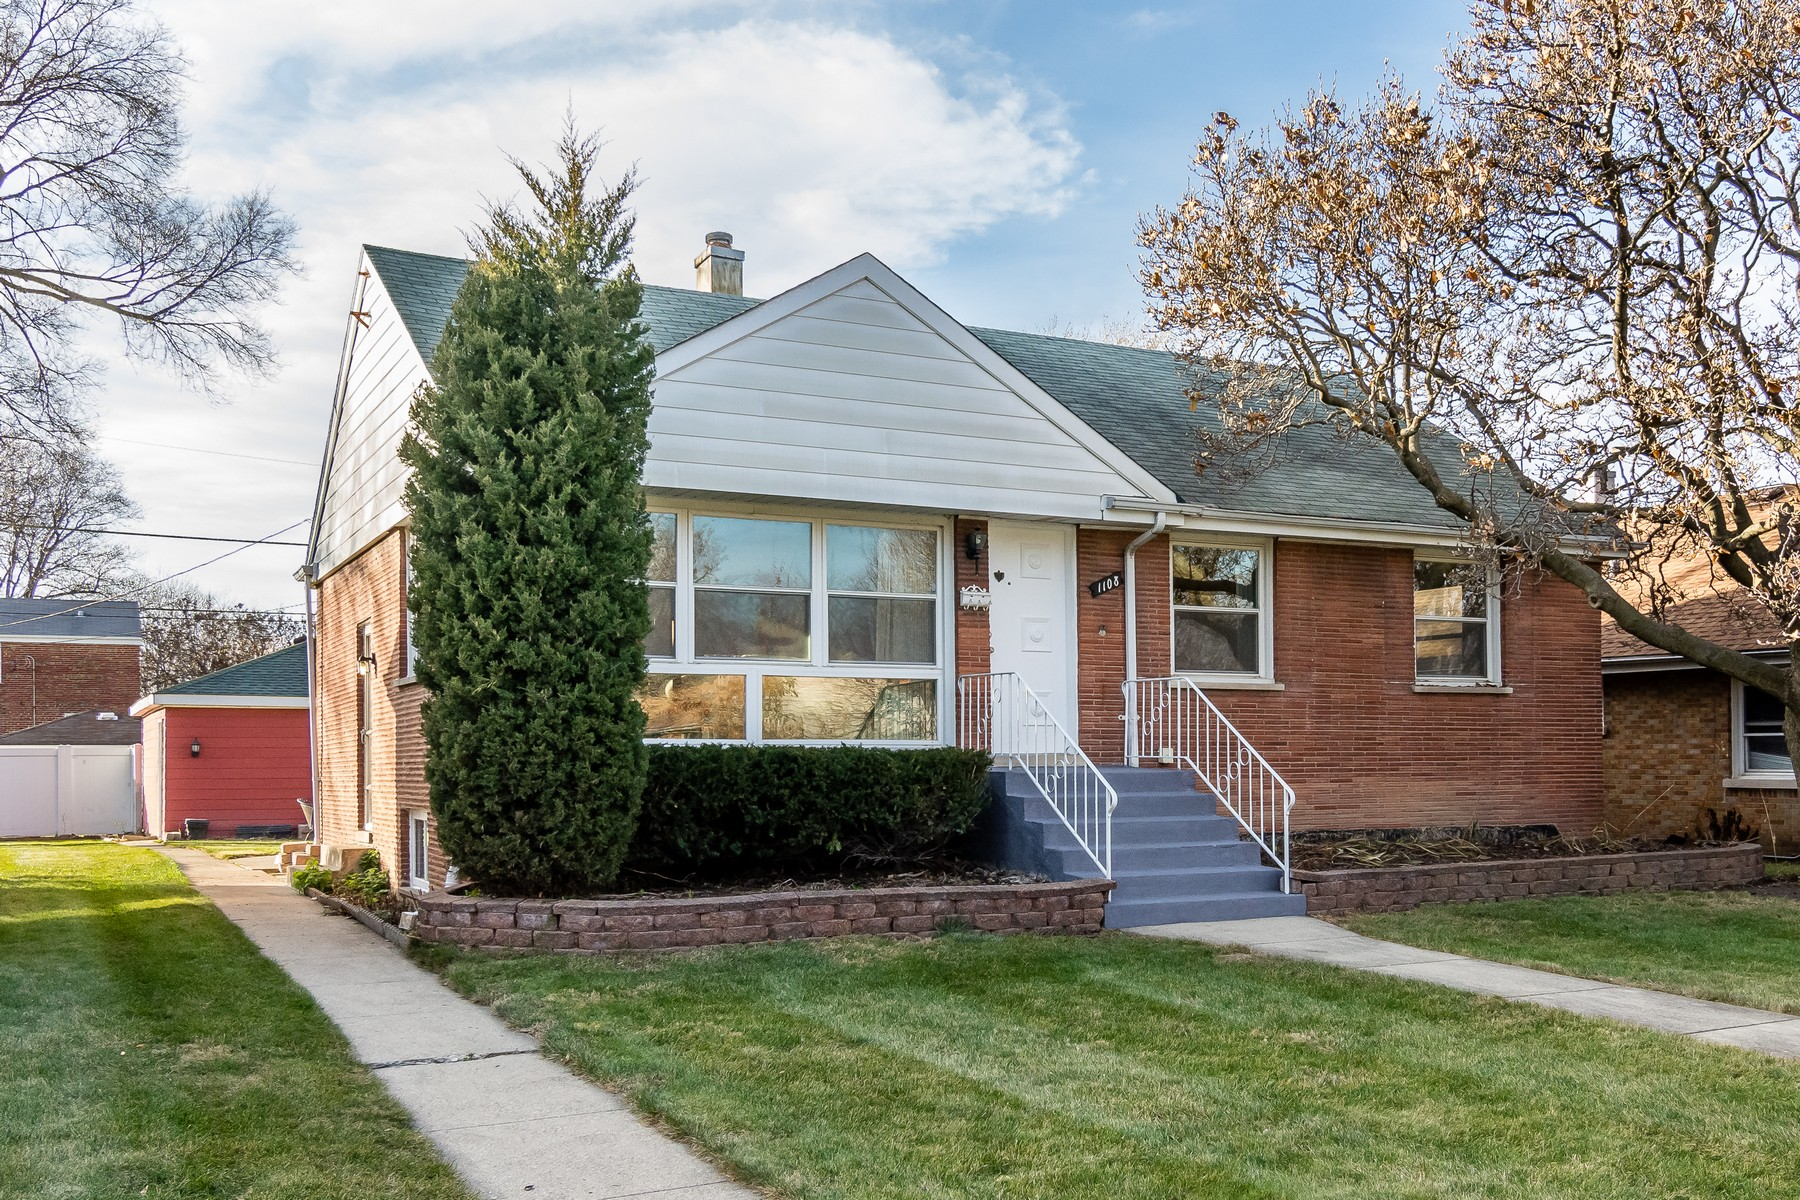 واحد منزل الأسرة للـ Sale في Updated Cozy Ranch 1108 Newcastle Avenue, Westchester, Illinois, 60154 United States